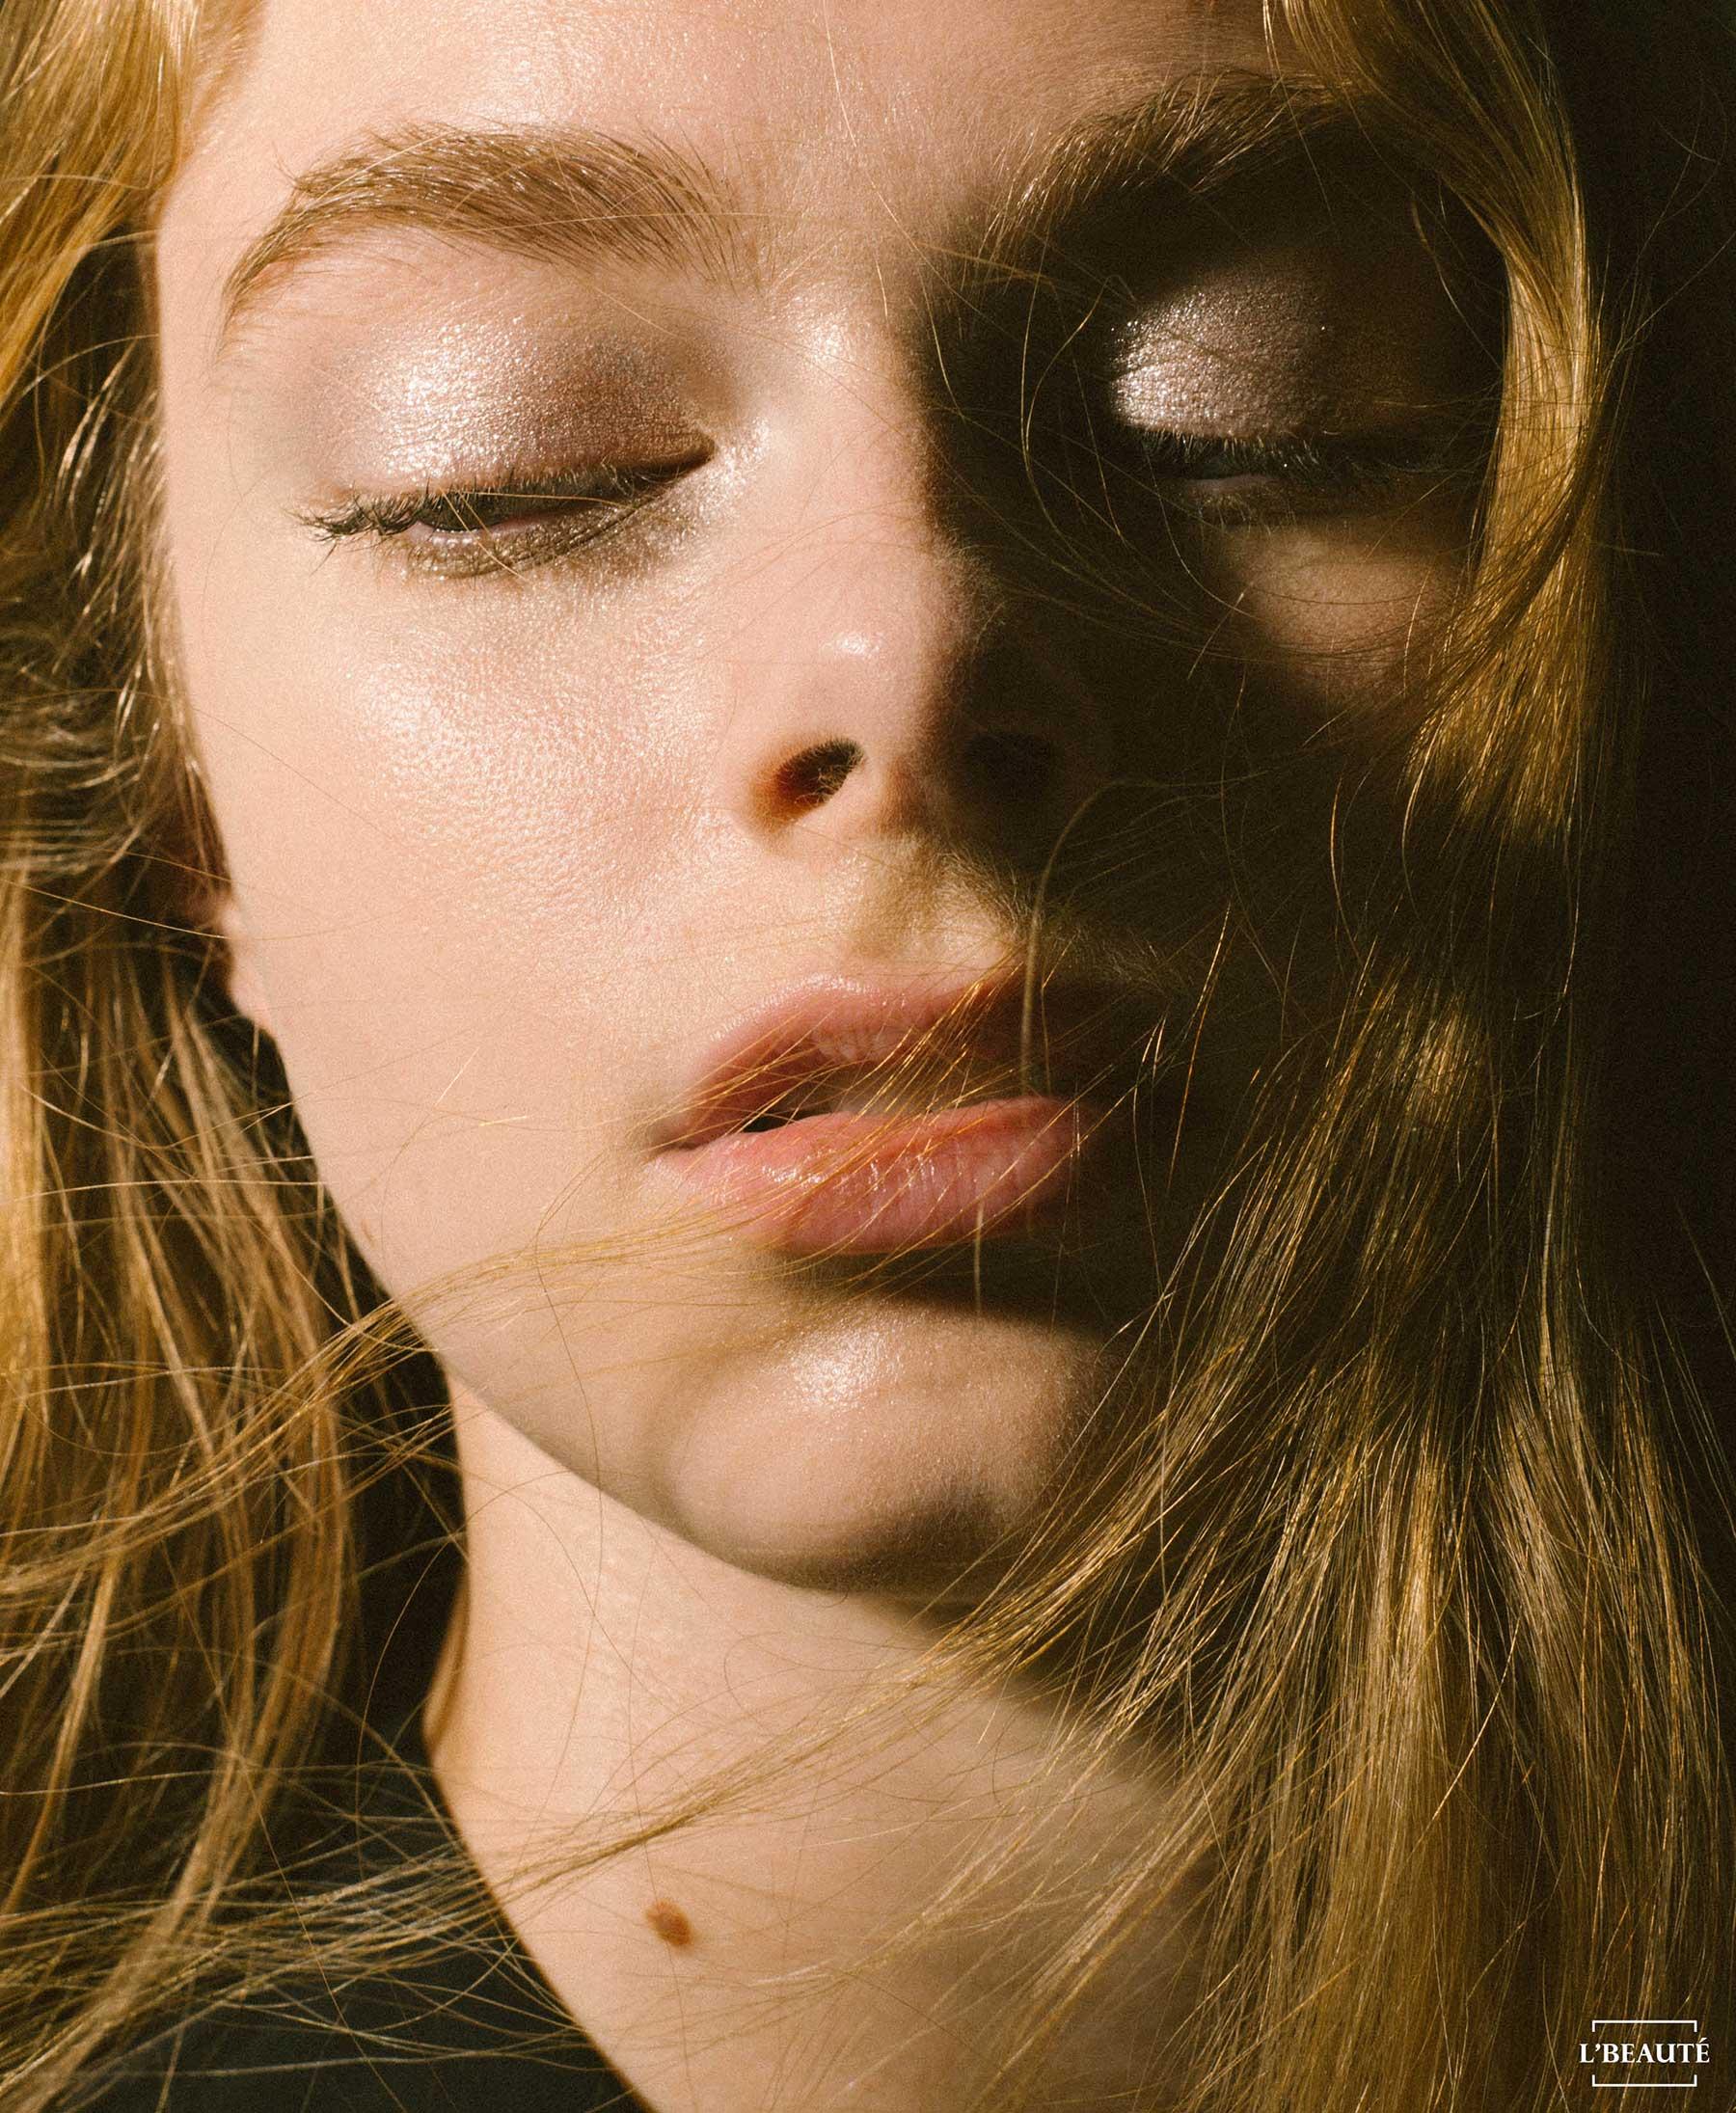 Beauty-Givenchy-Nicolas-Degennes7